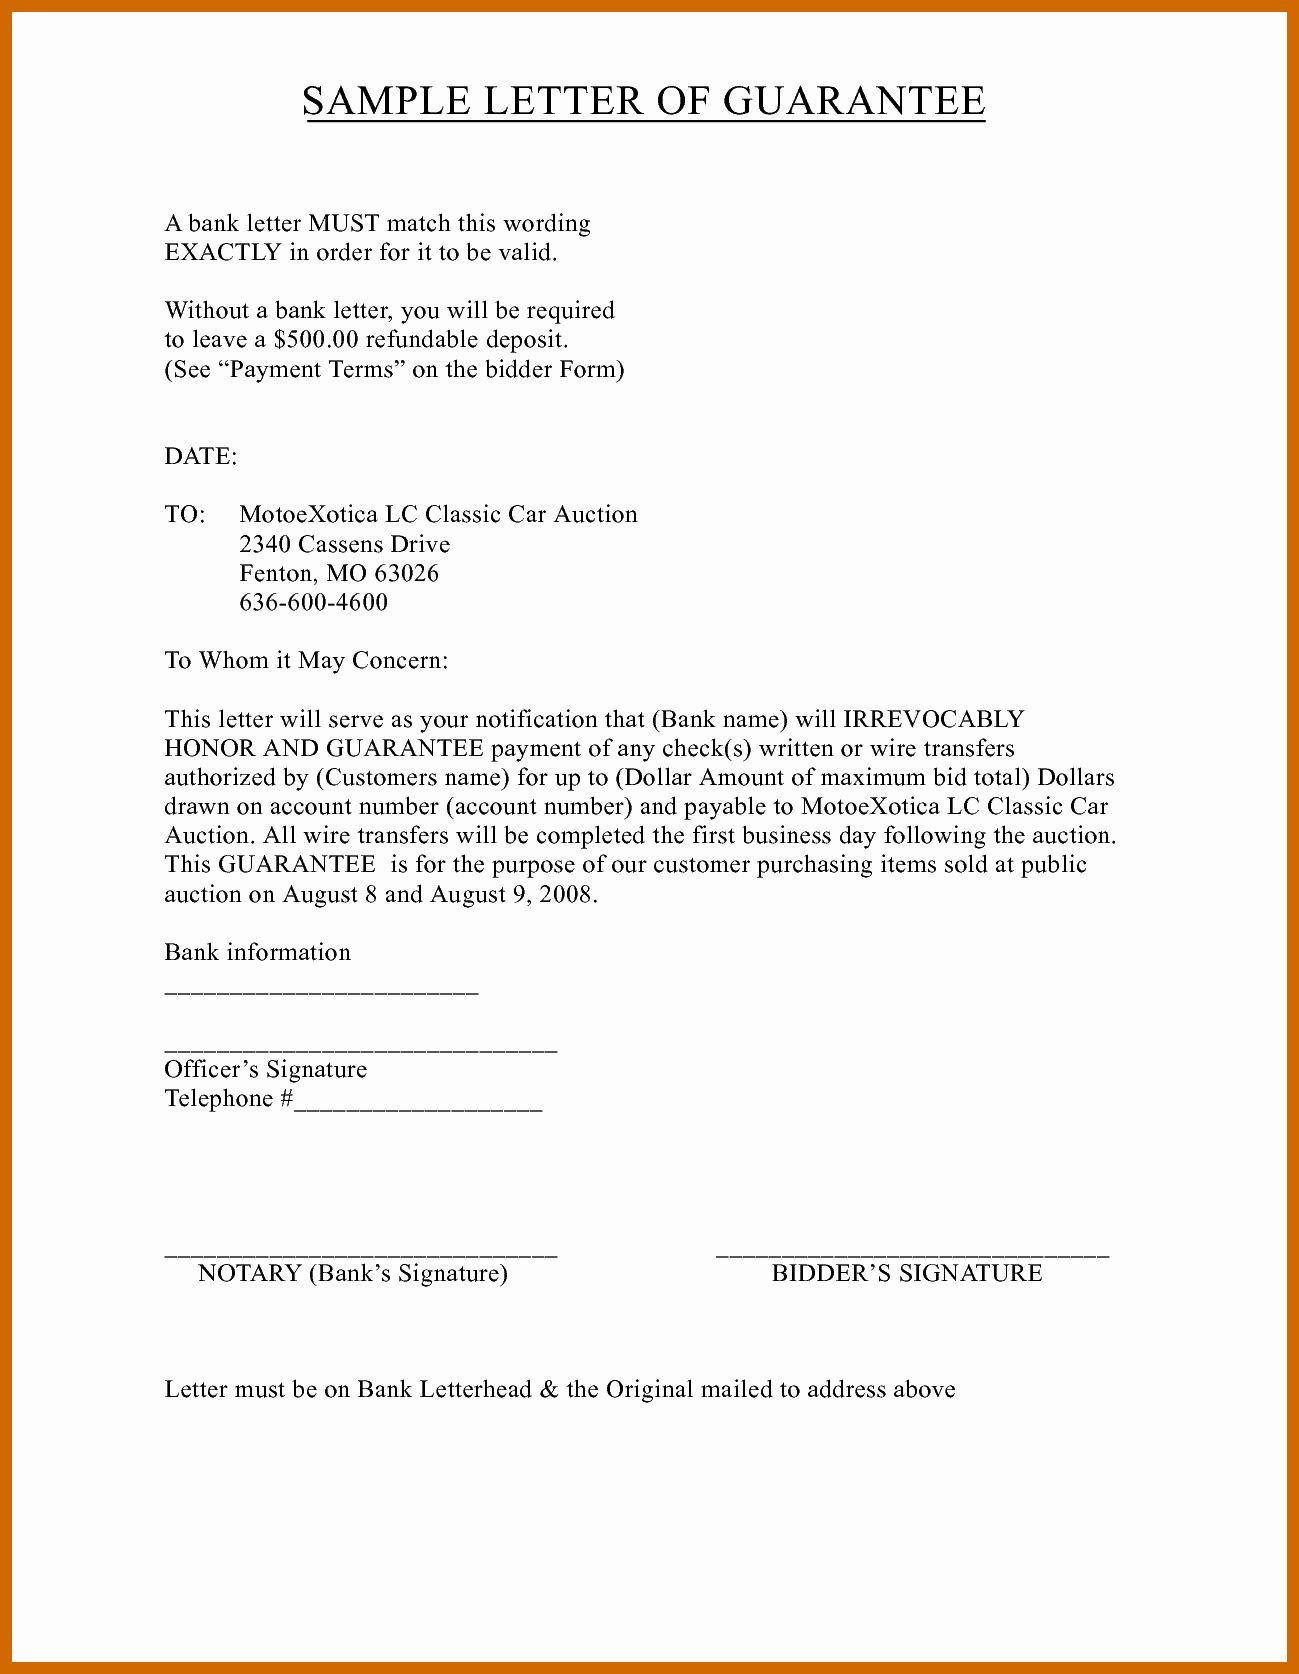 Letter Of Guarantee Template Elegant 4 5 Guarantee Letter Sample Lettering Letter Writing Template Executive Summary Template